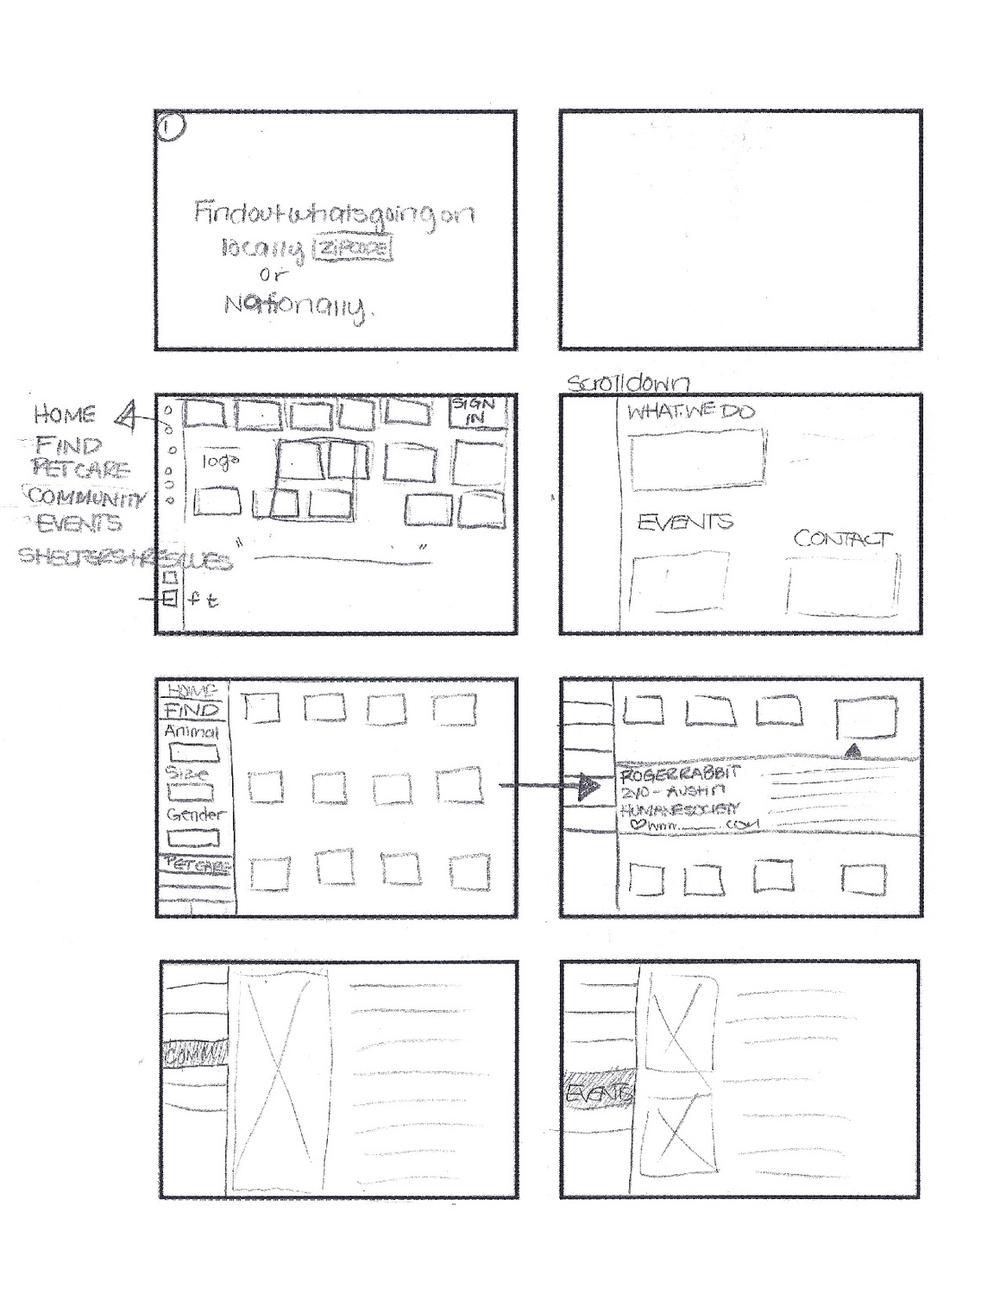 Petprocess-05.jpg